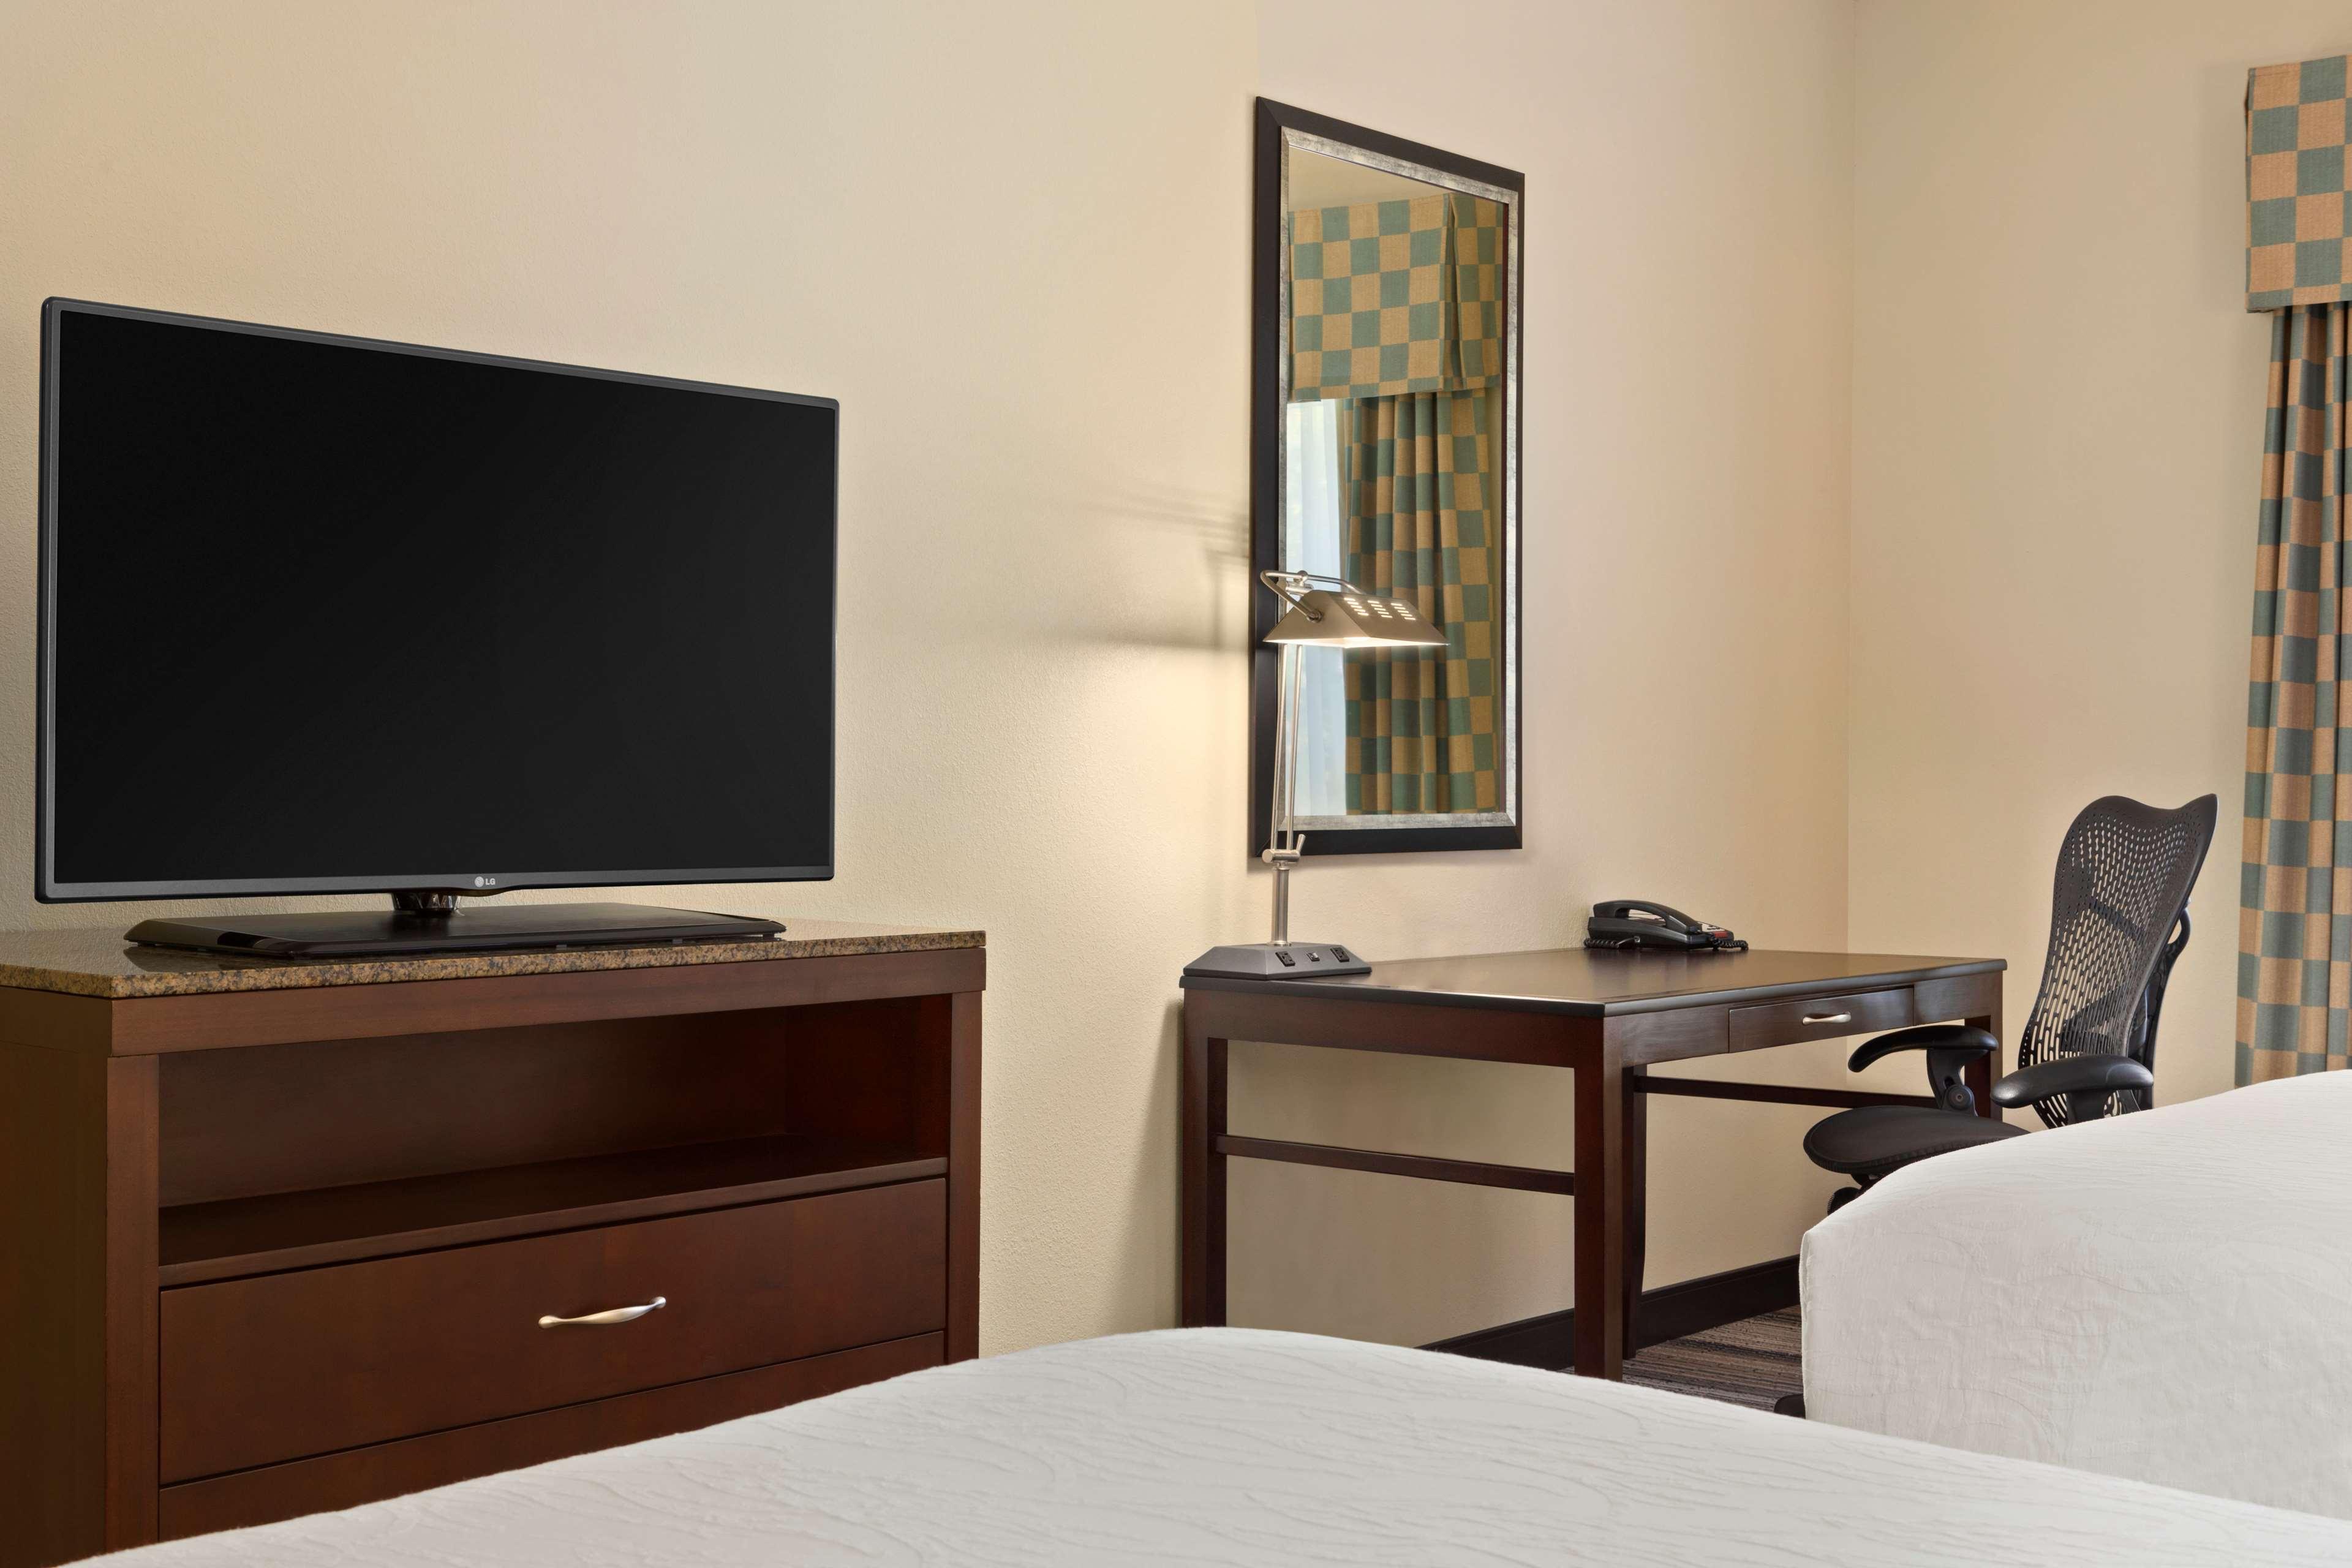 Hilton Garden Inn Winston-Salem/Hanes Mall image 21